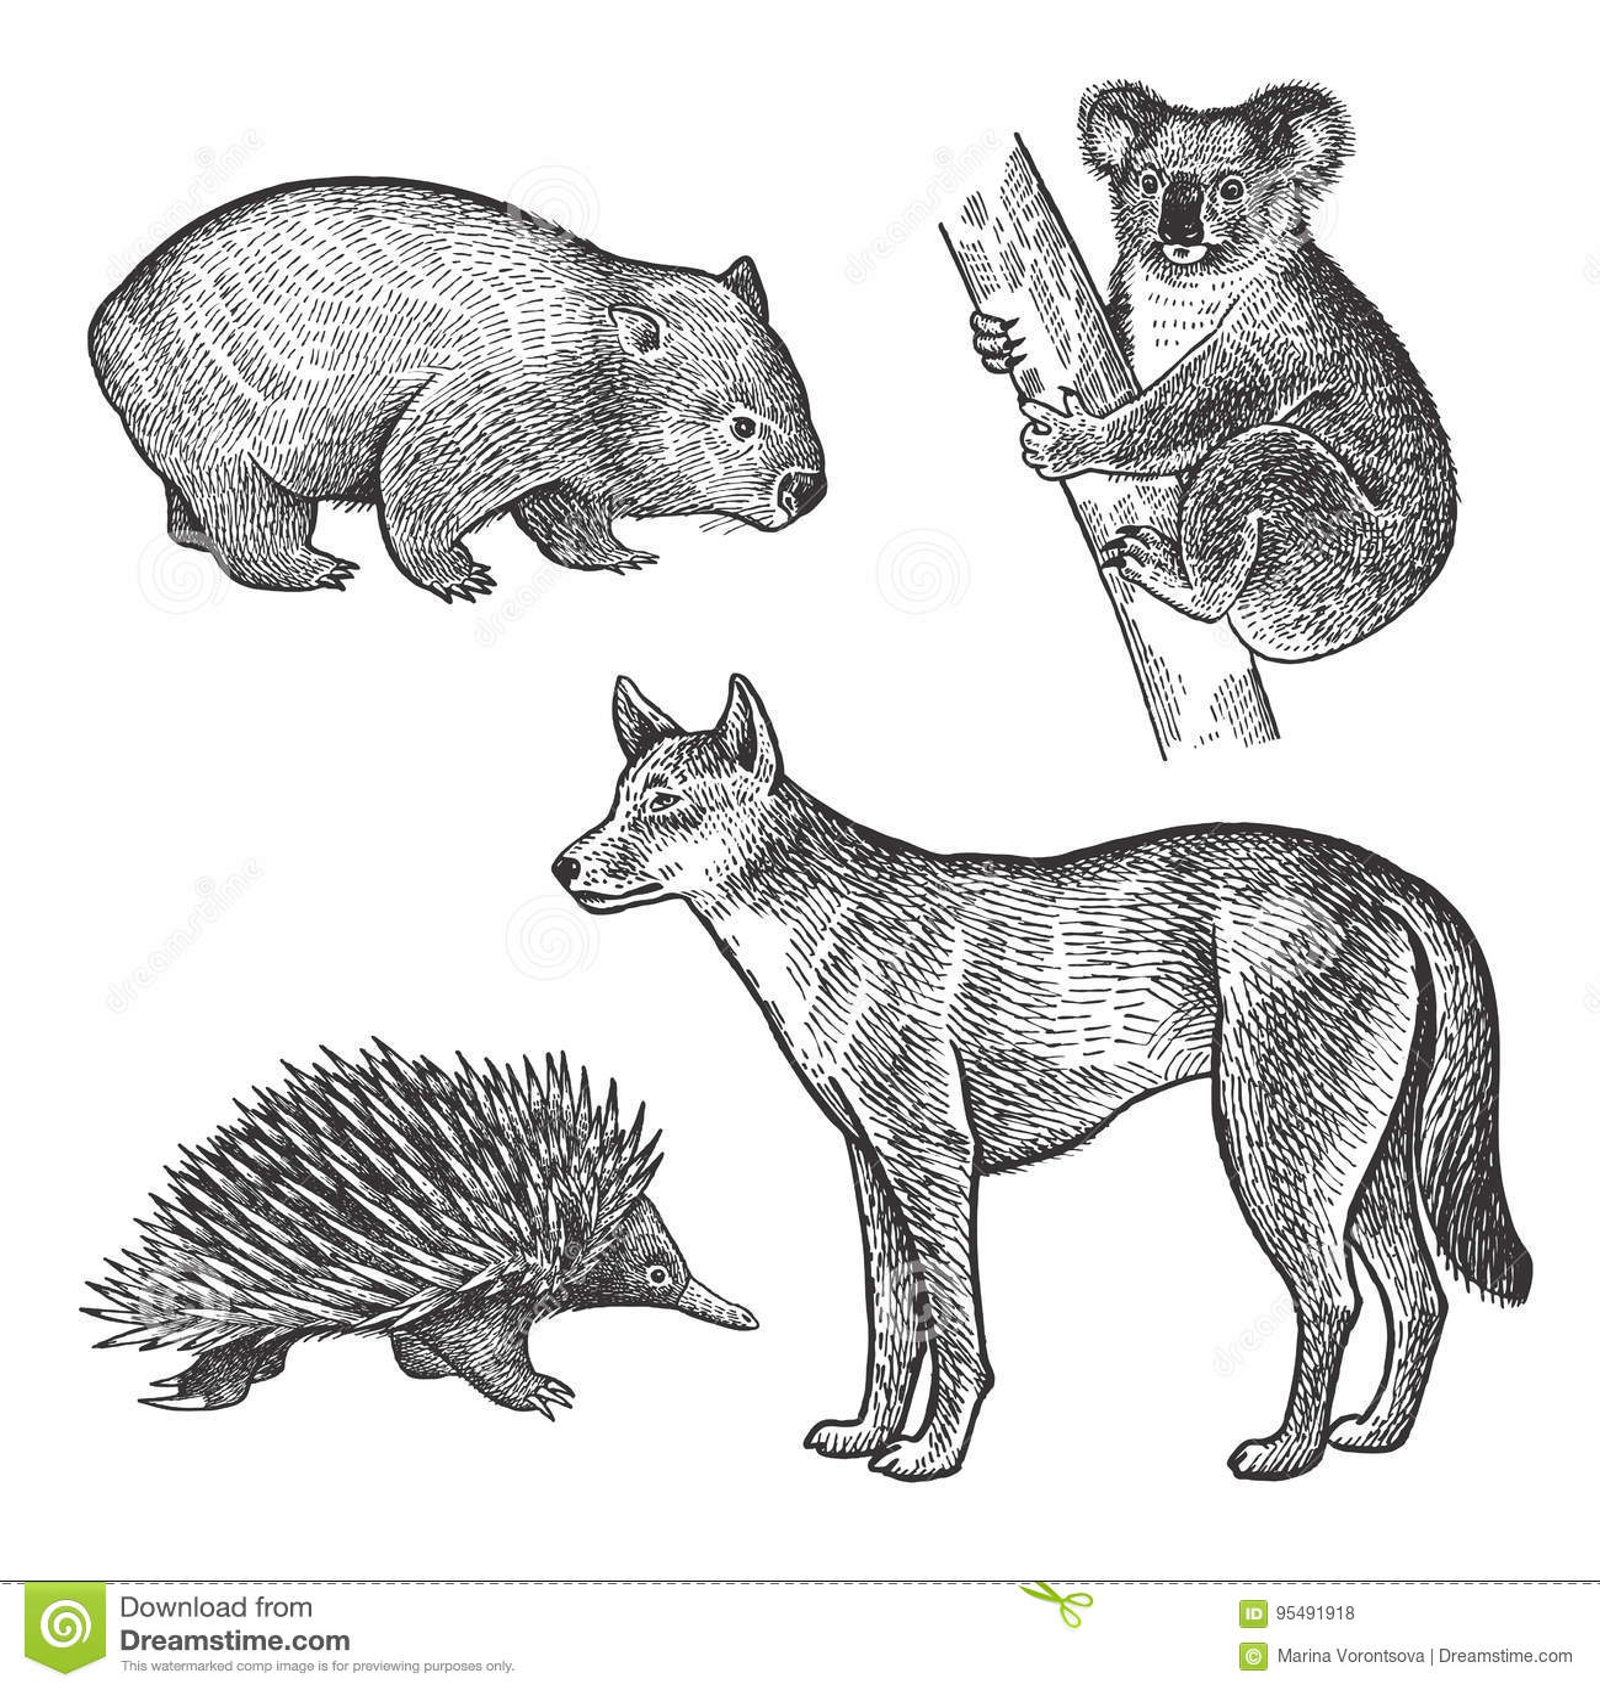 How To Draw A Wombat Art Hub